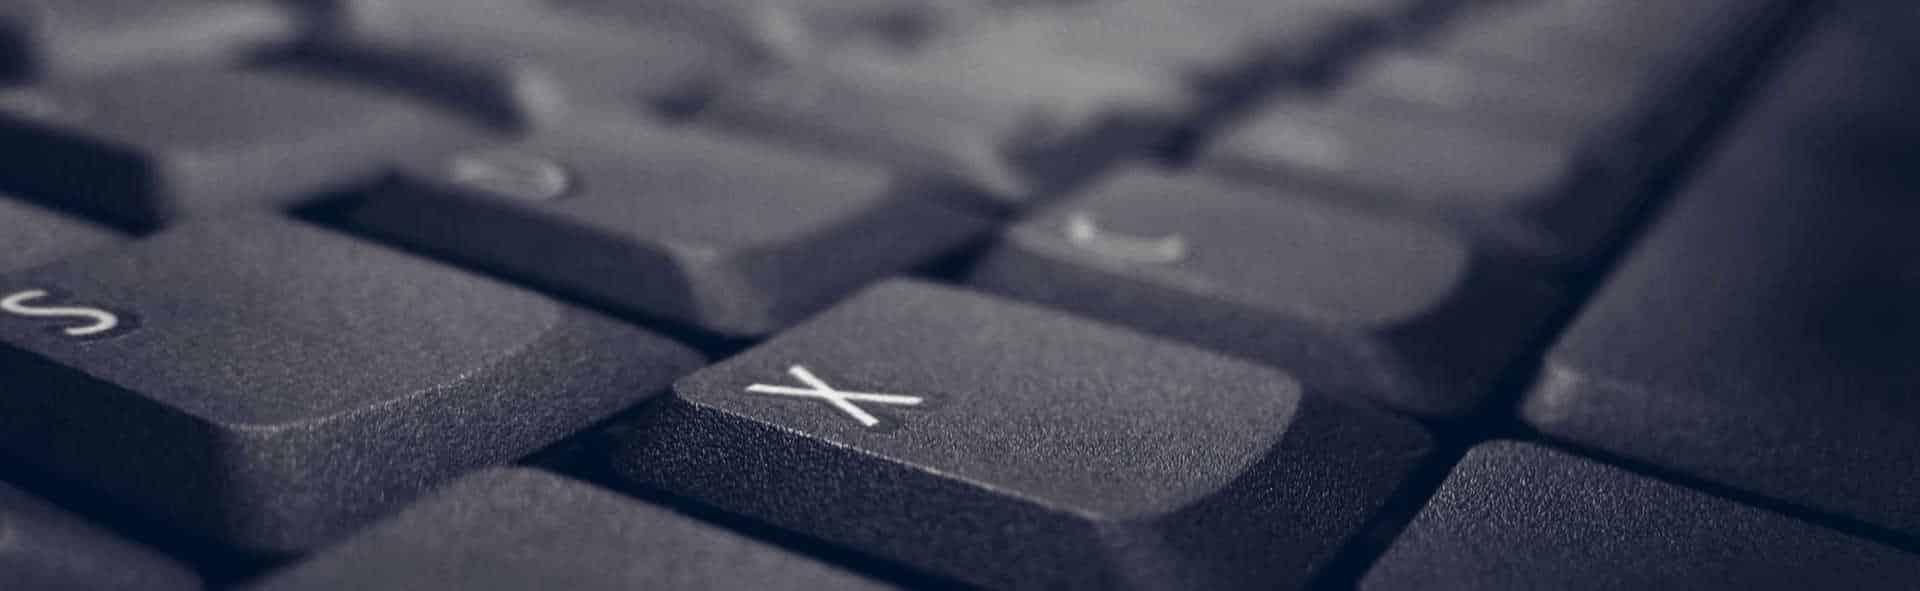 Computer Keyboard - Głównie JavaScript